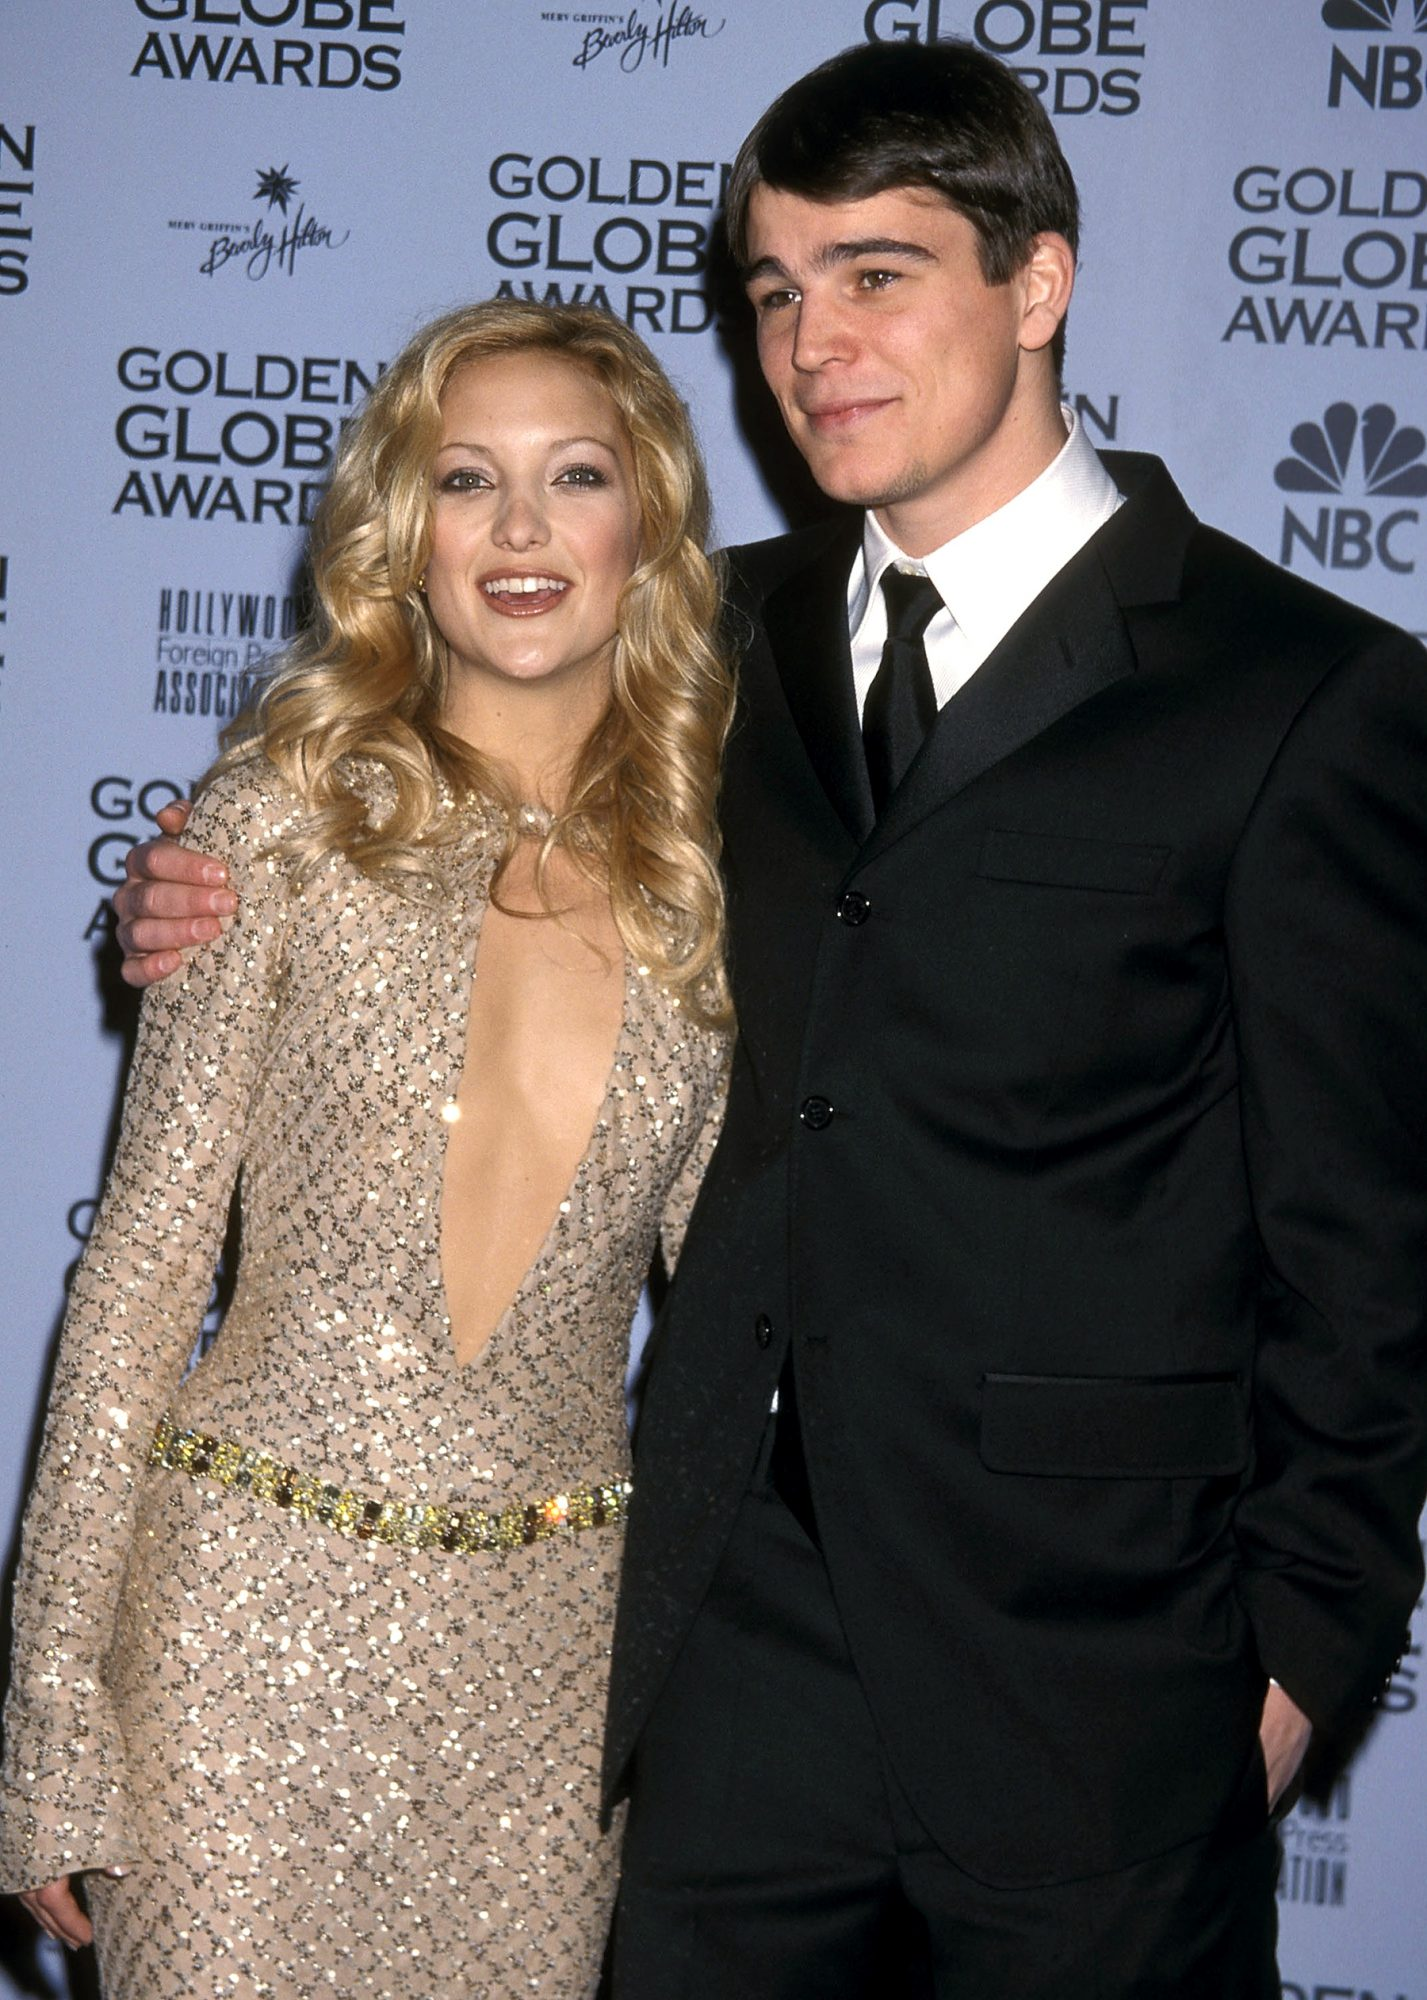 59th Annual Golden Globe Awards - Press Room